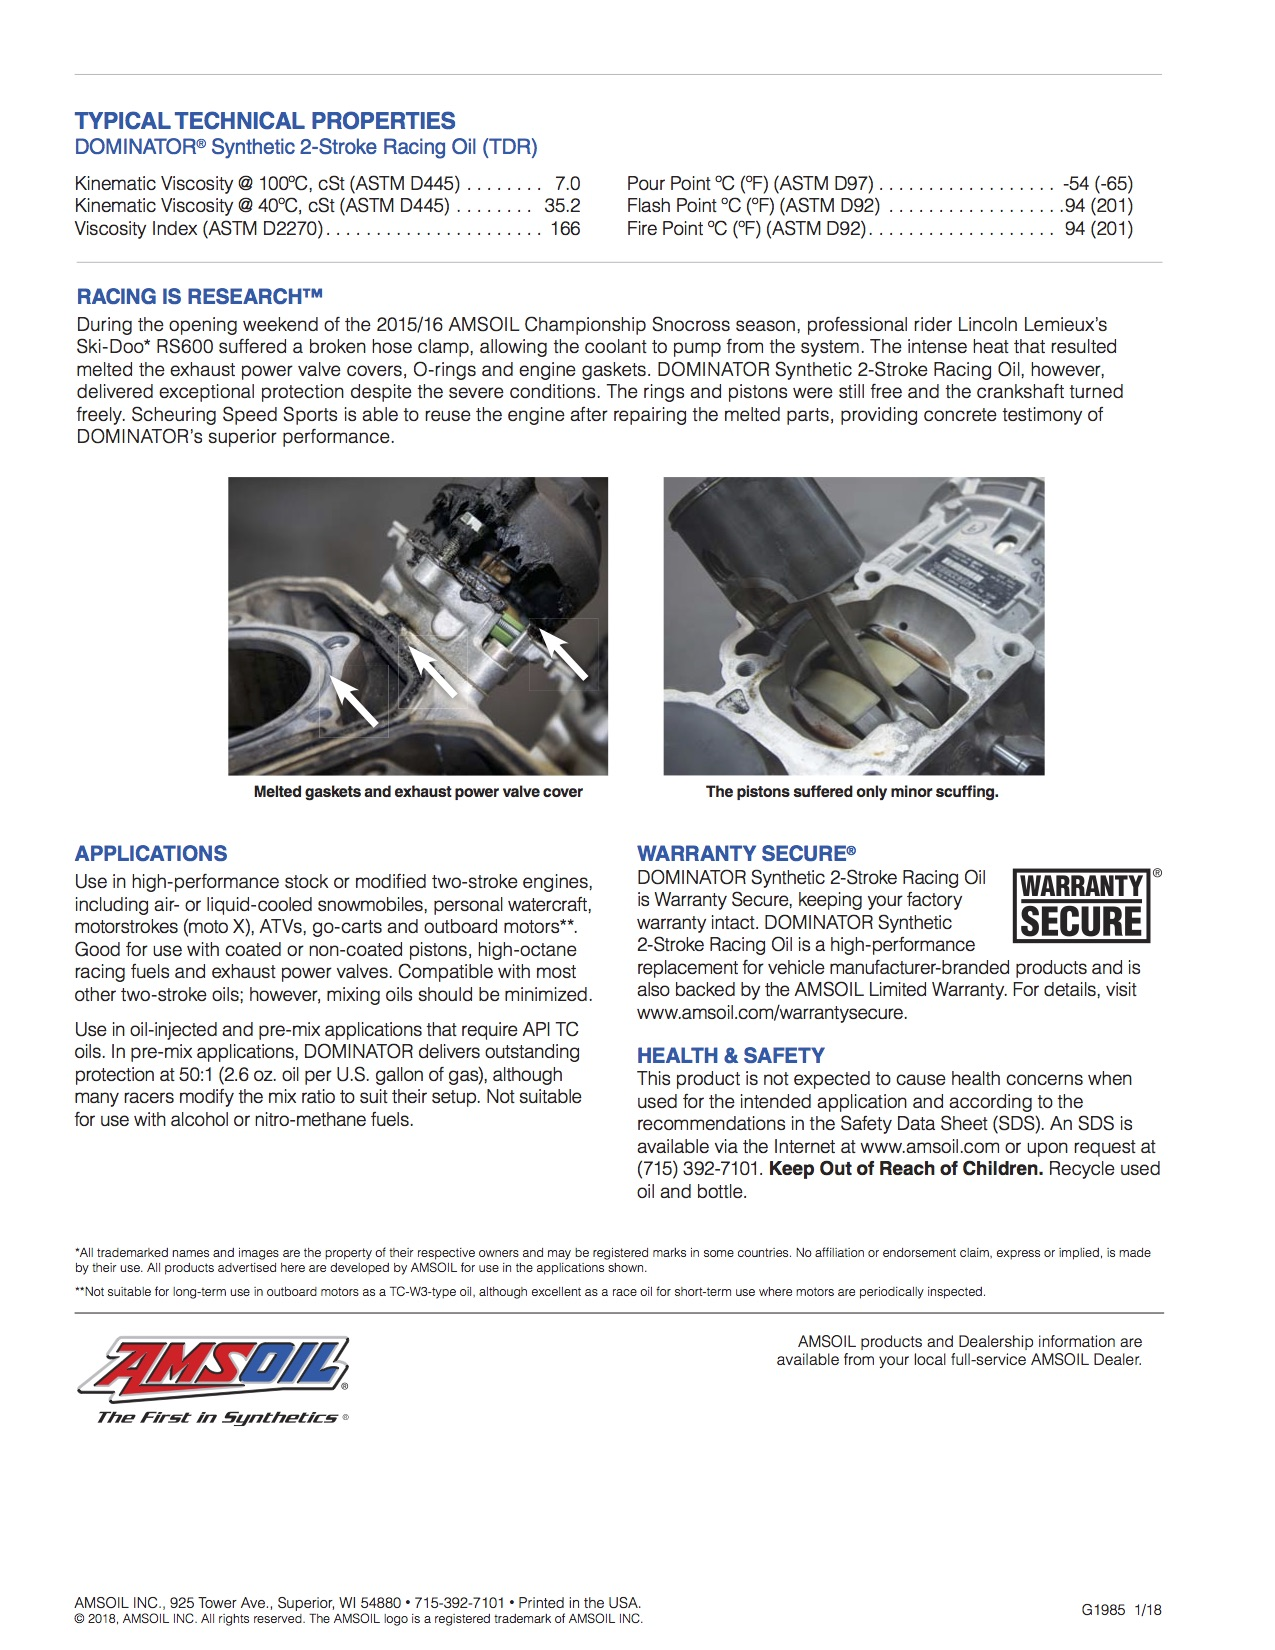 DOMINATOR® Synthetic 2-Stroke Racing Oil (TDR)